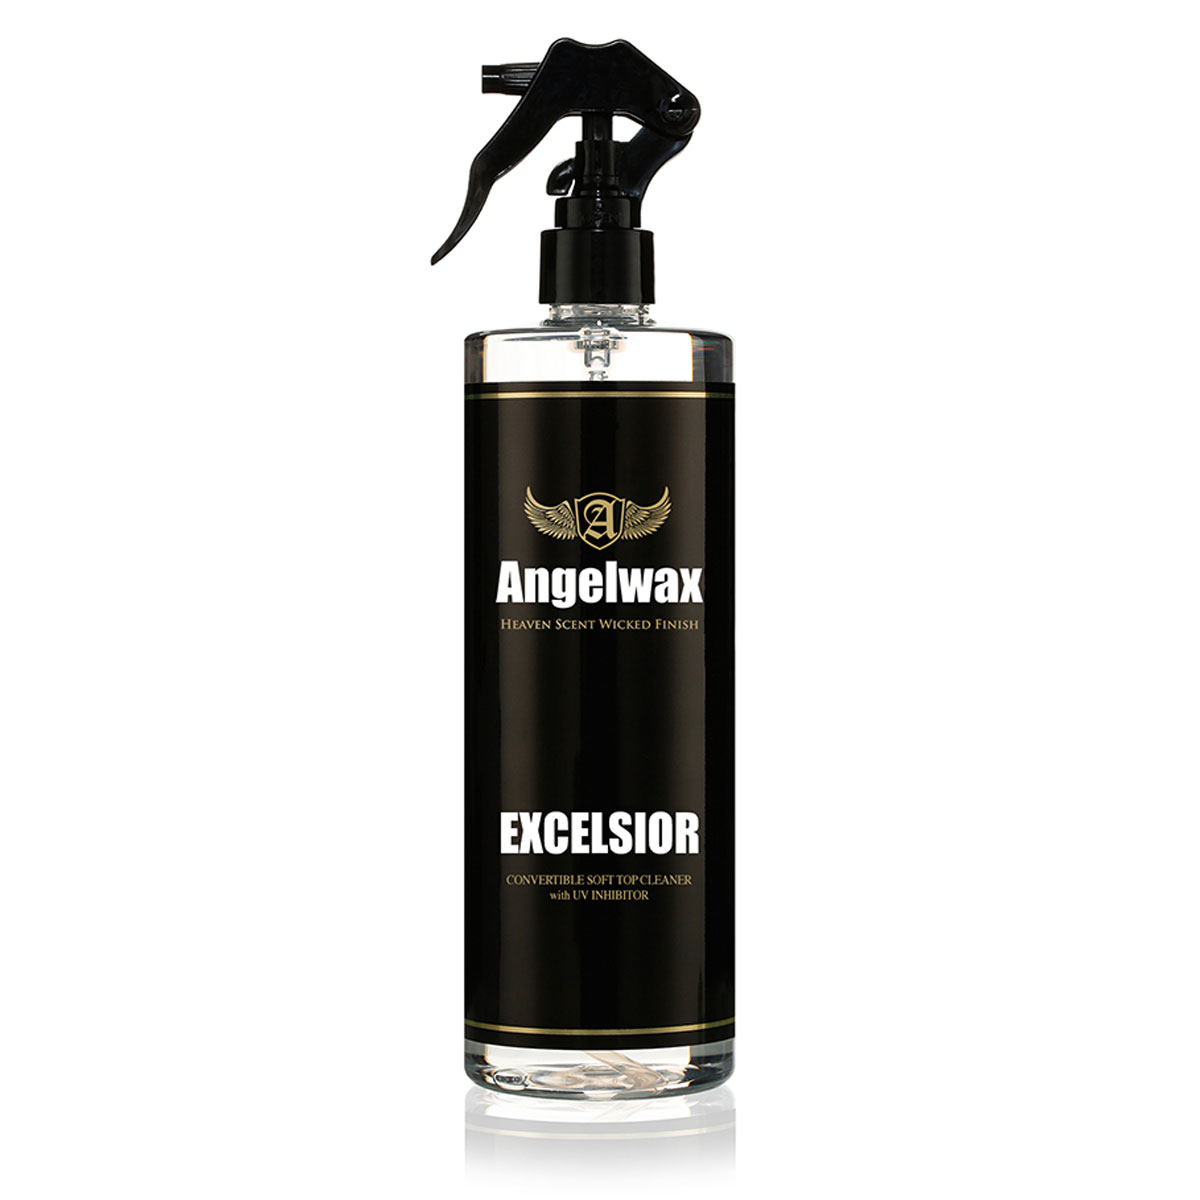 Sufflettrengöring Angelwax Excelsior, 500 ml